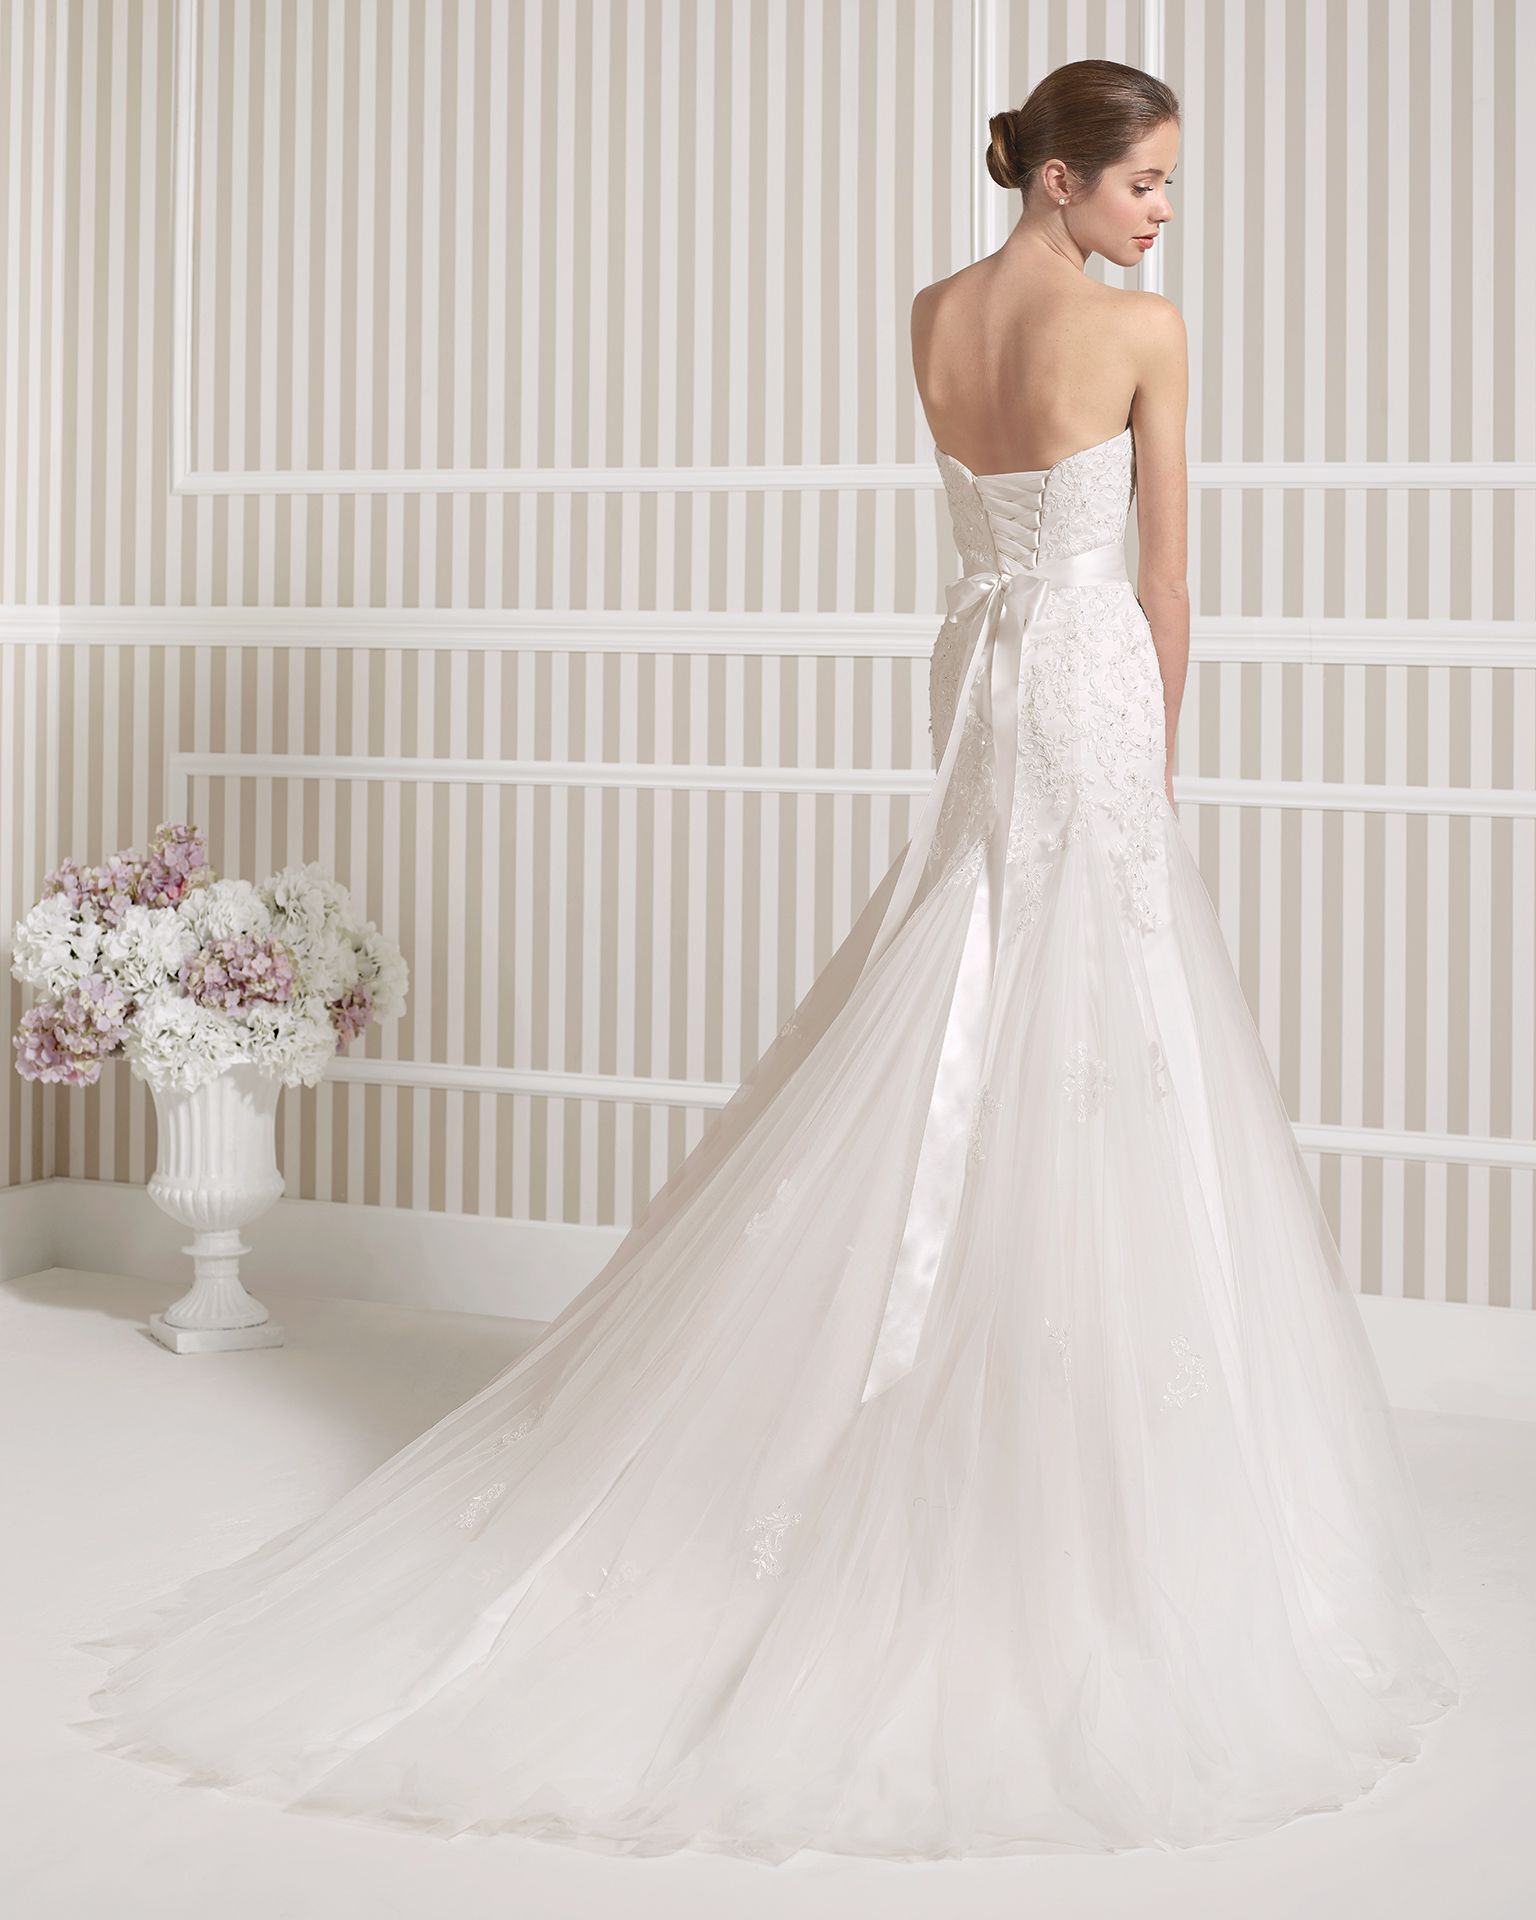 S lavanda wedding dresses collection luna novias